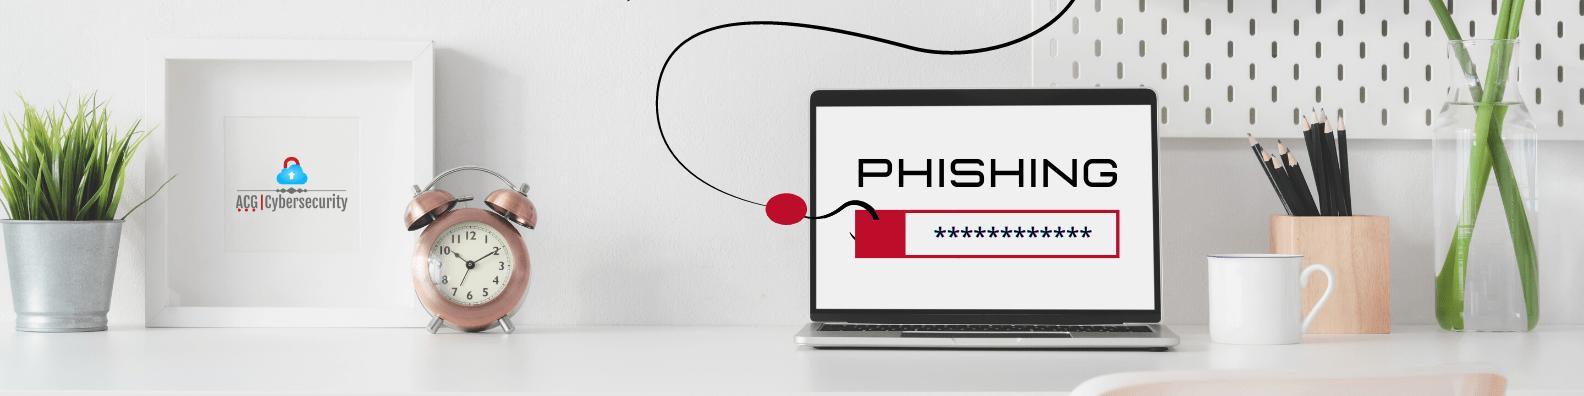 Simulation de campagnes phishing